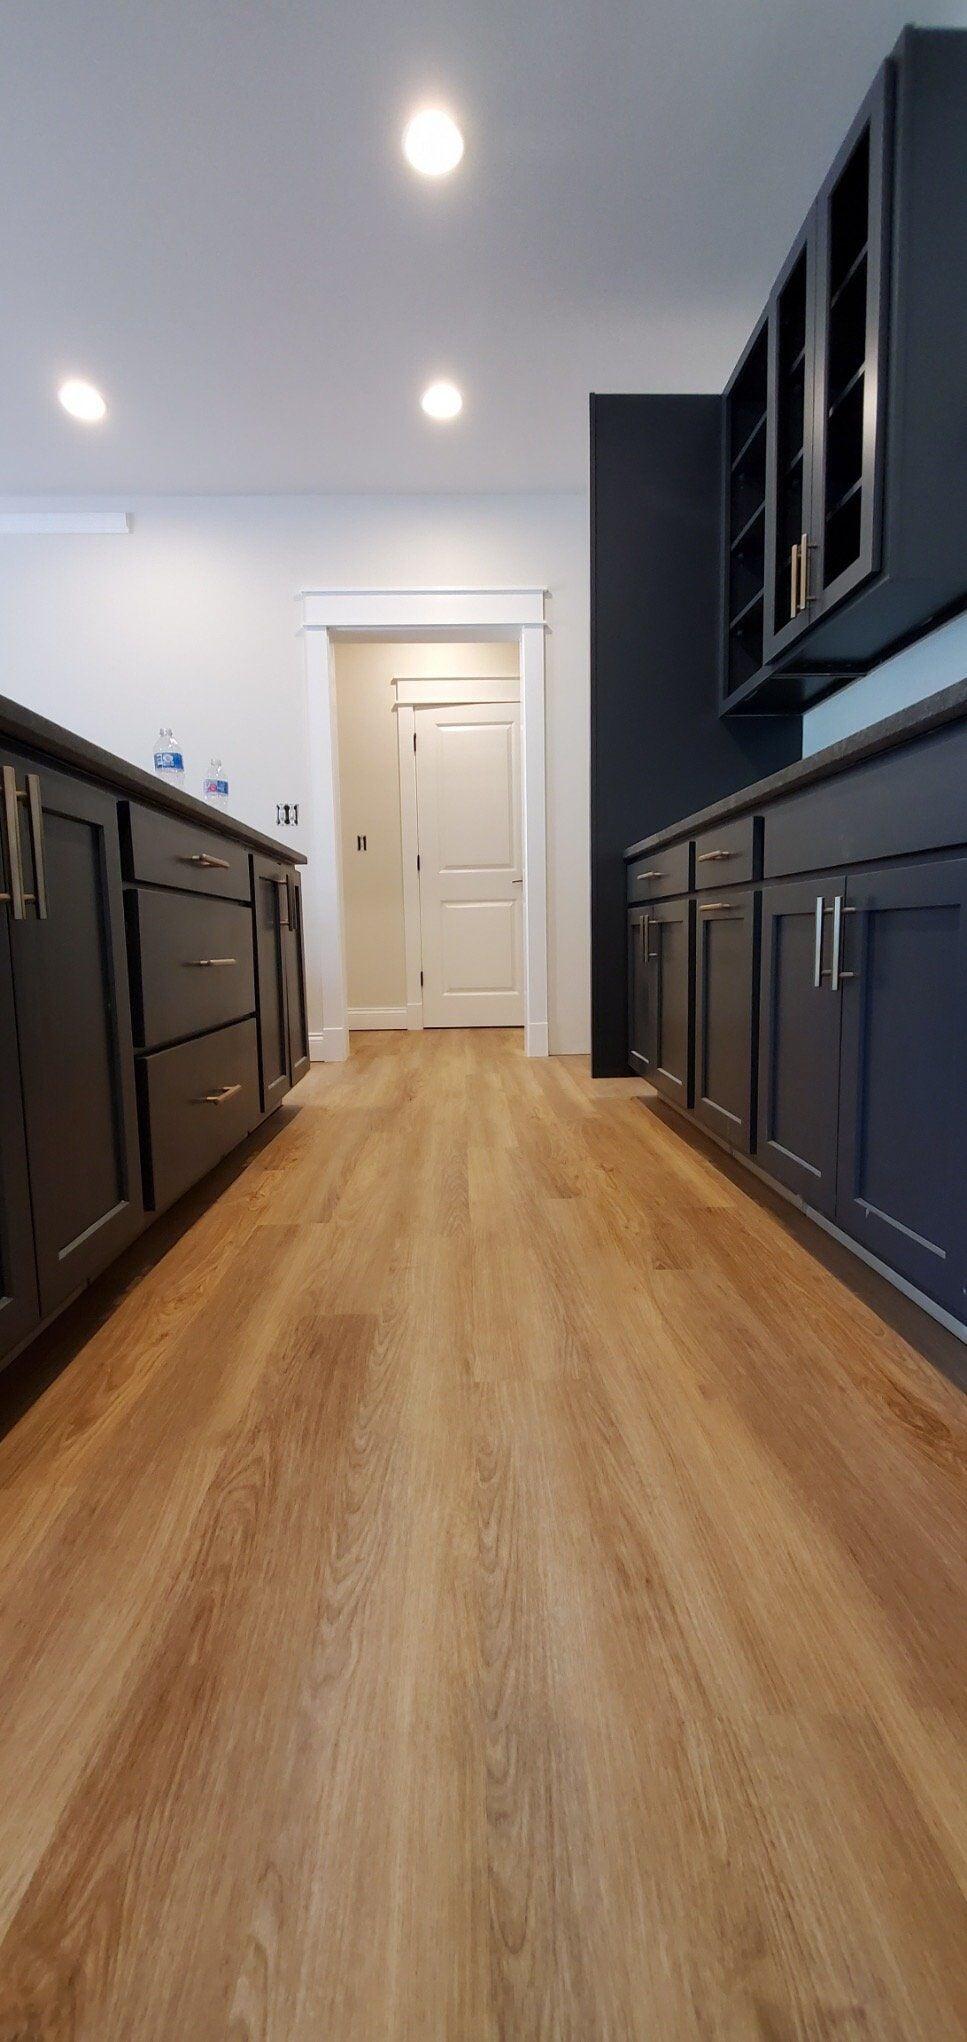 Luxury vinyl plank in Wilmore, KY from Karrianna Flooring